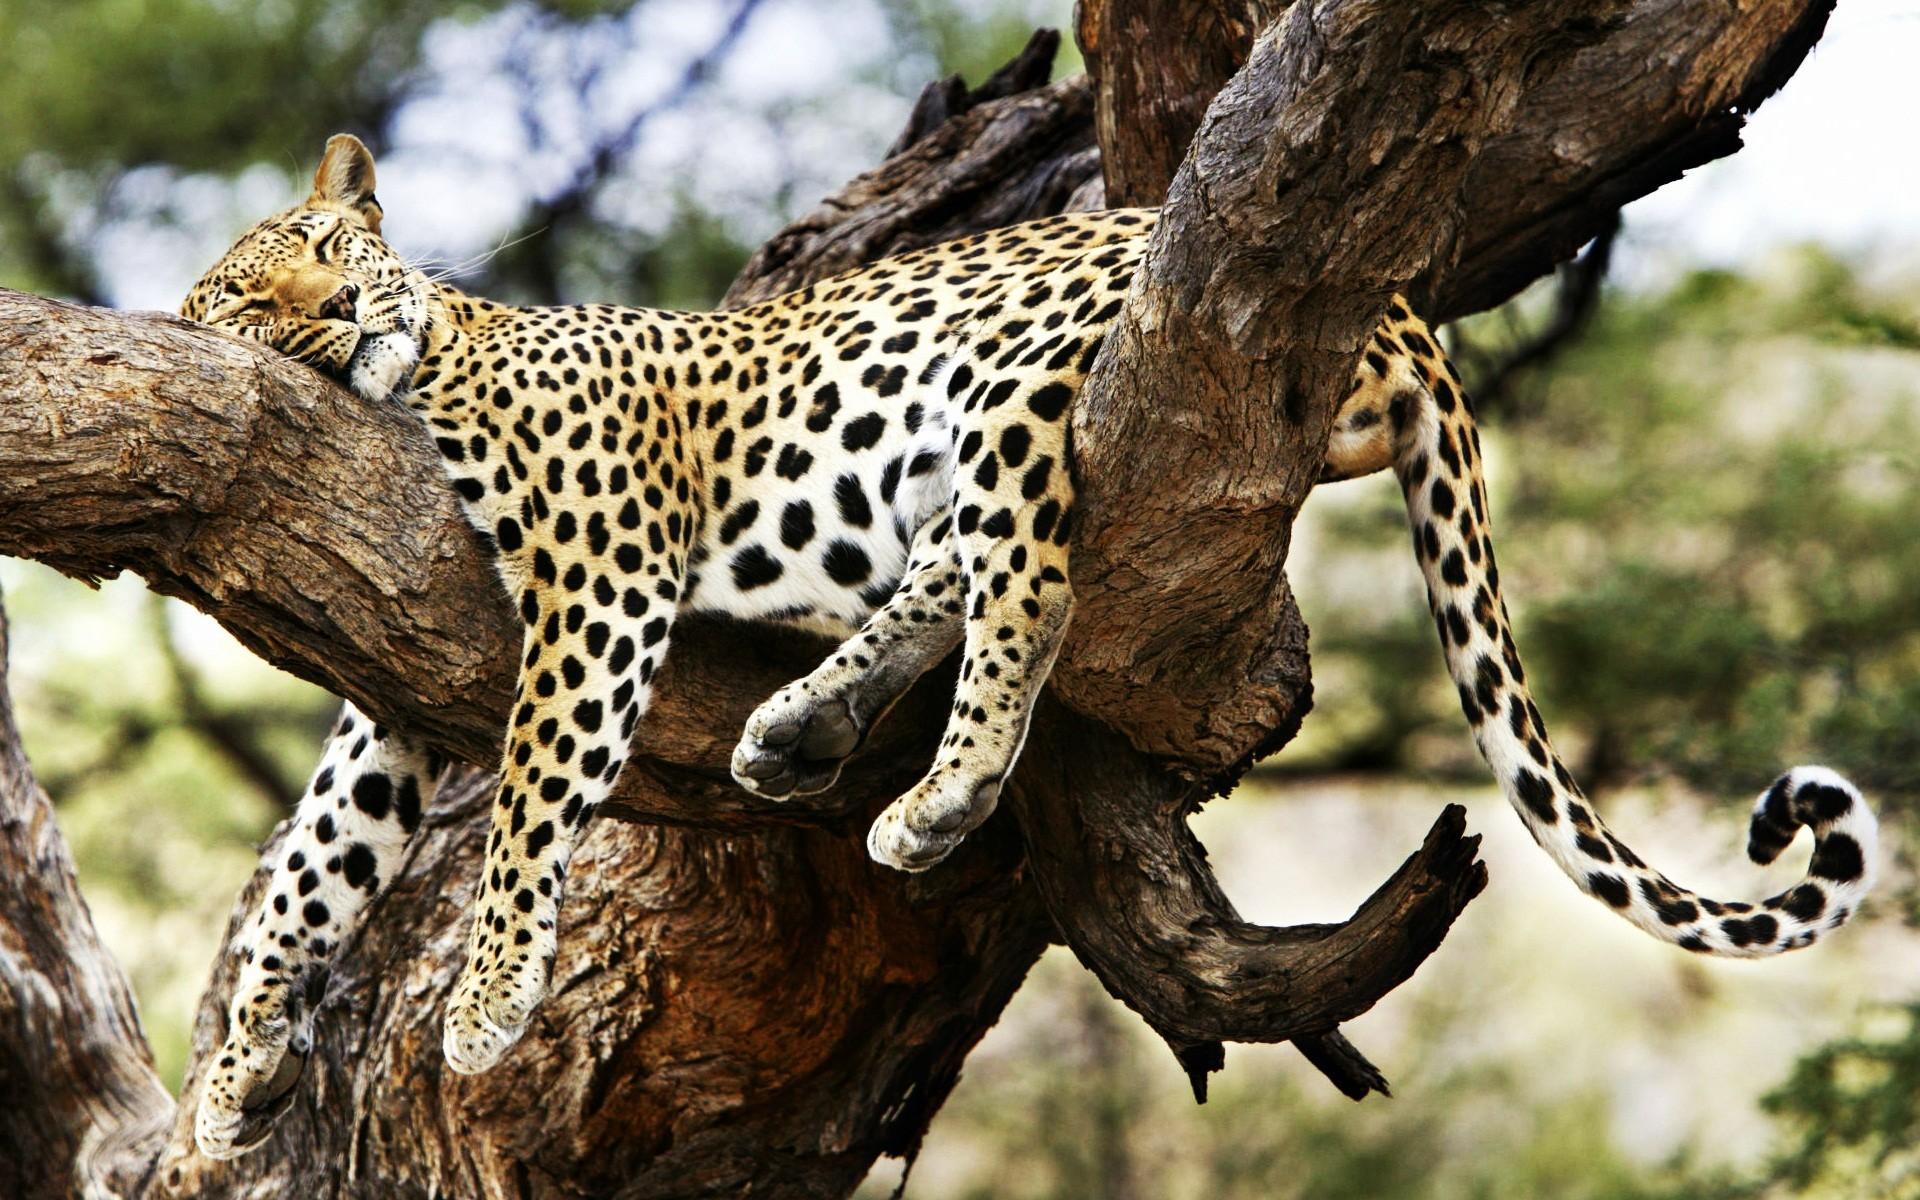 Cute cheetah wallpaper 58 images 1920x1200 sleeping cheetah voltagebd Image collections